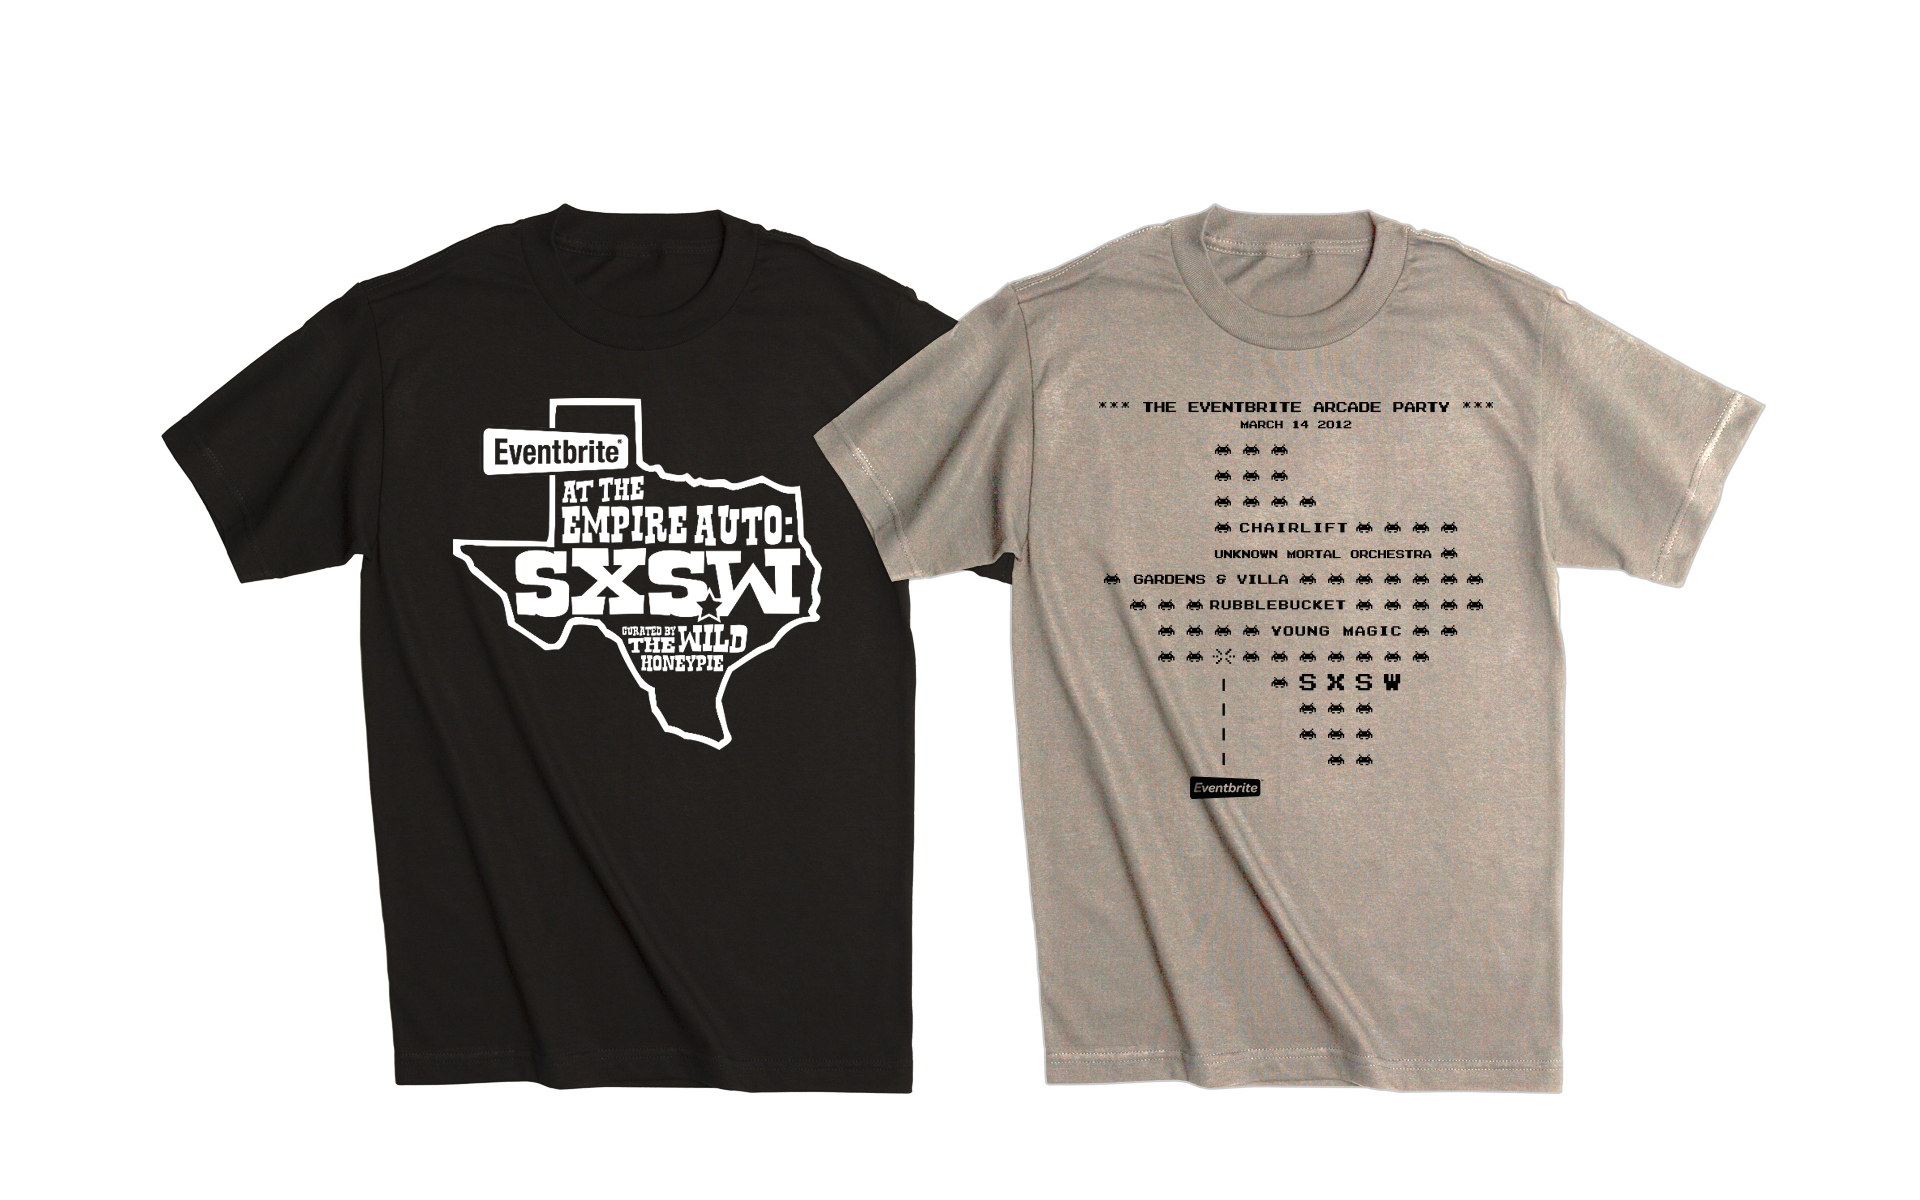 Eventbrite SXSW T-Shirts